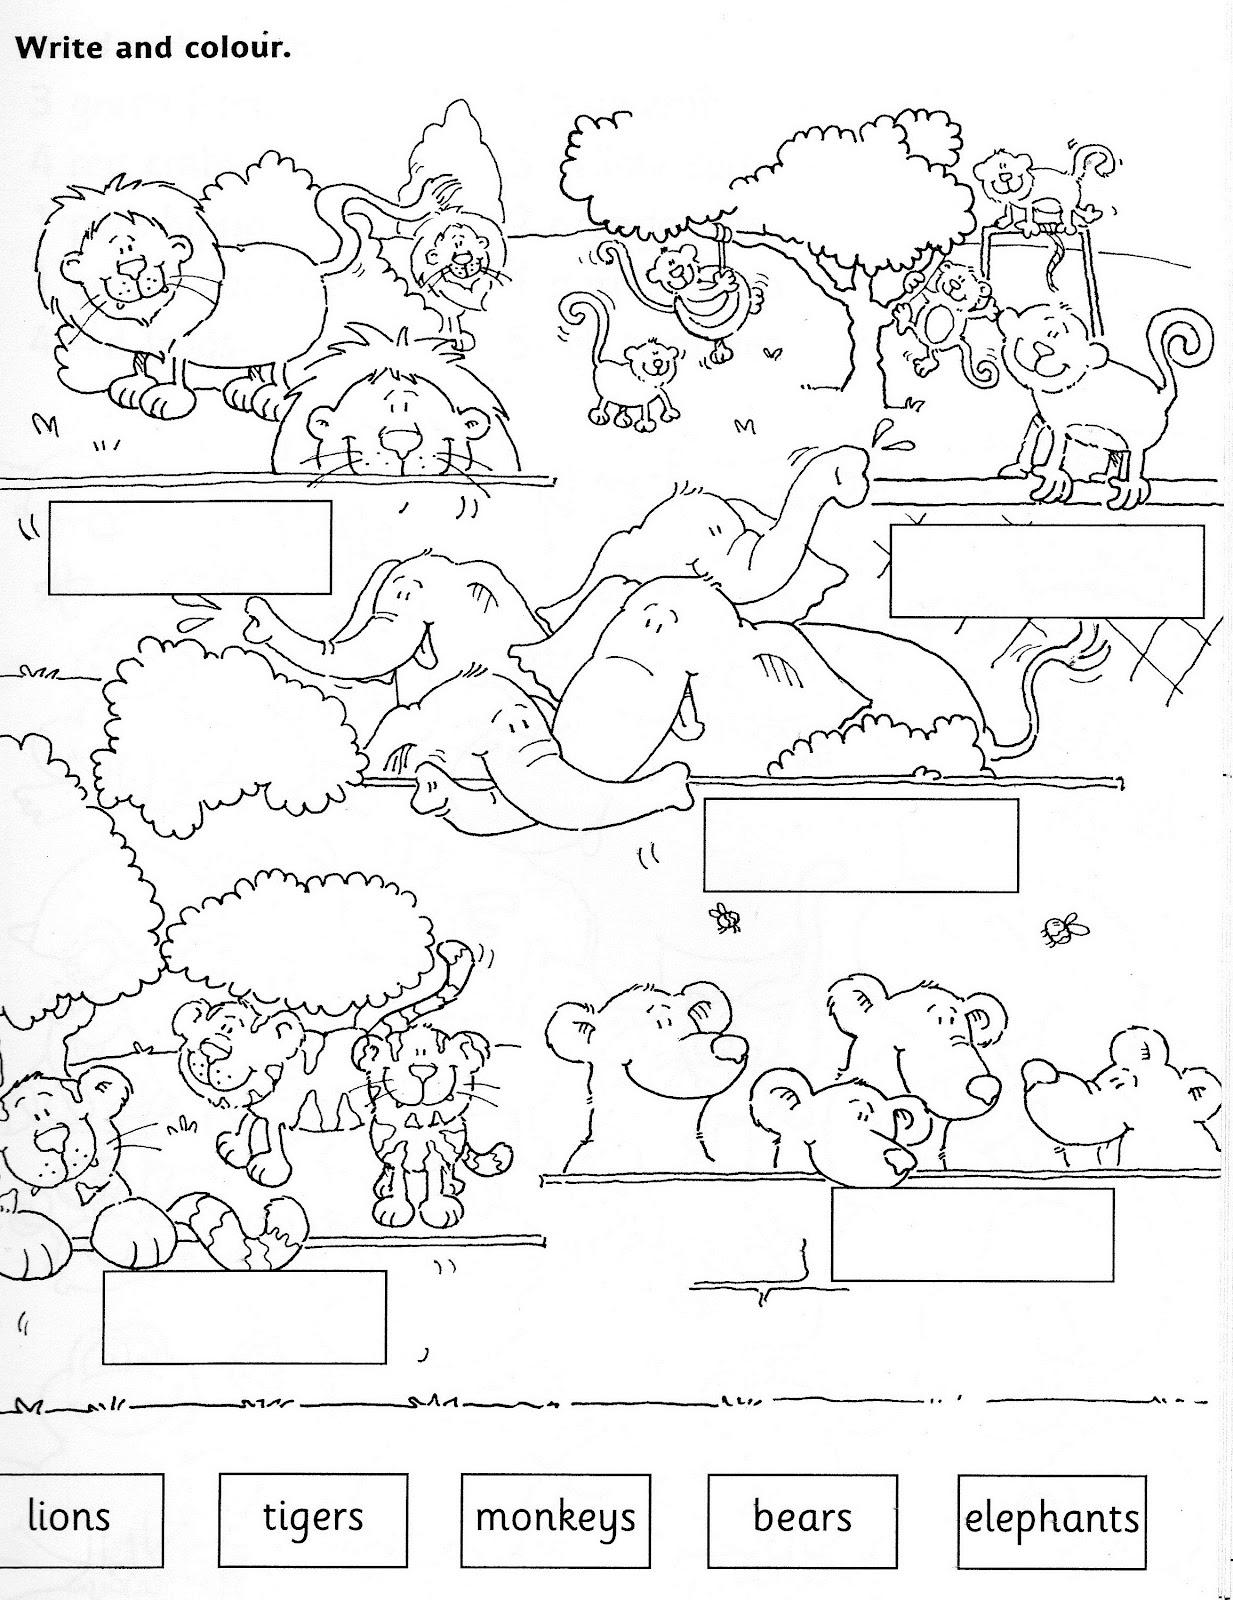 math worksheet : vocabularytake the pen : Pet And Wild Animals Worksheet For Kindergarten